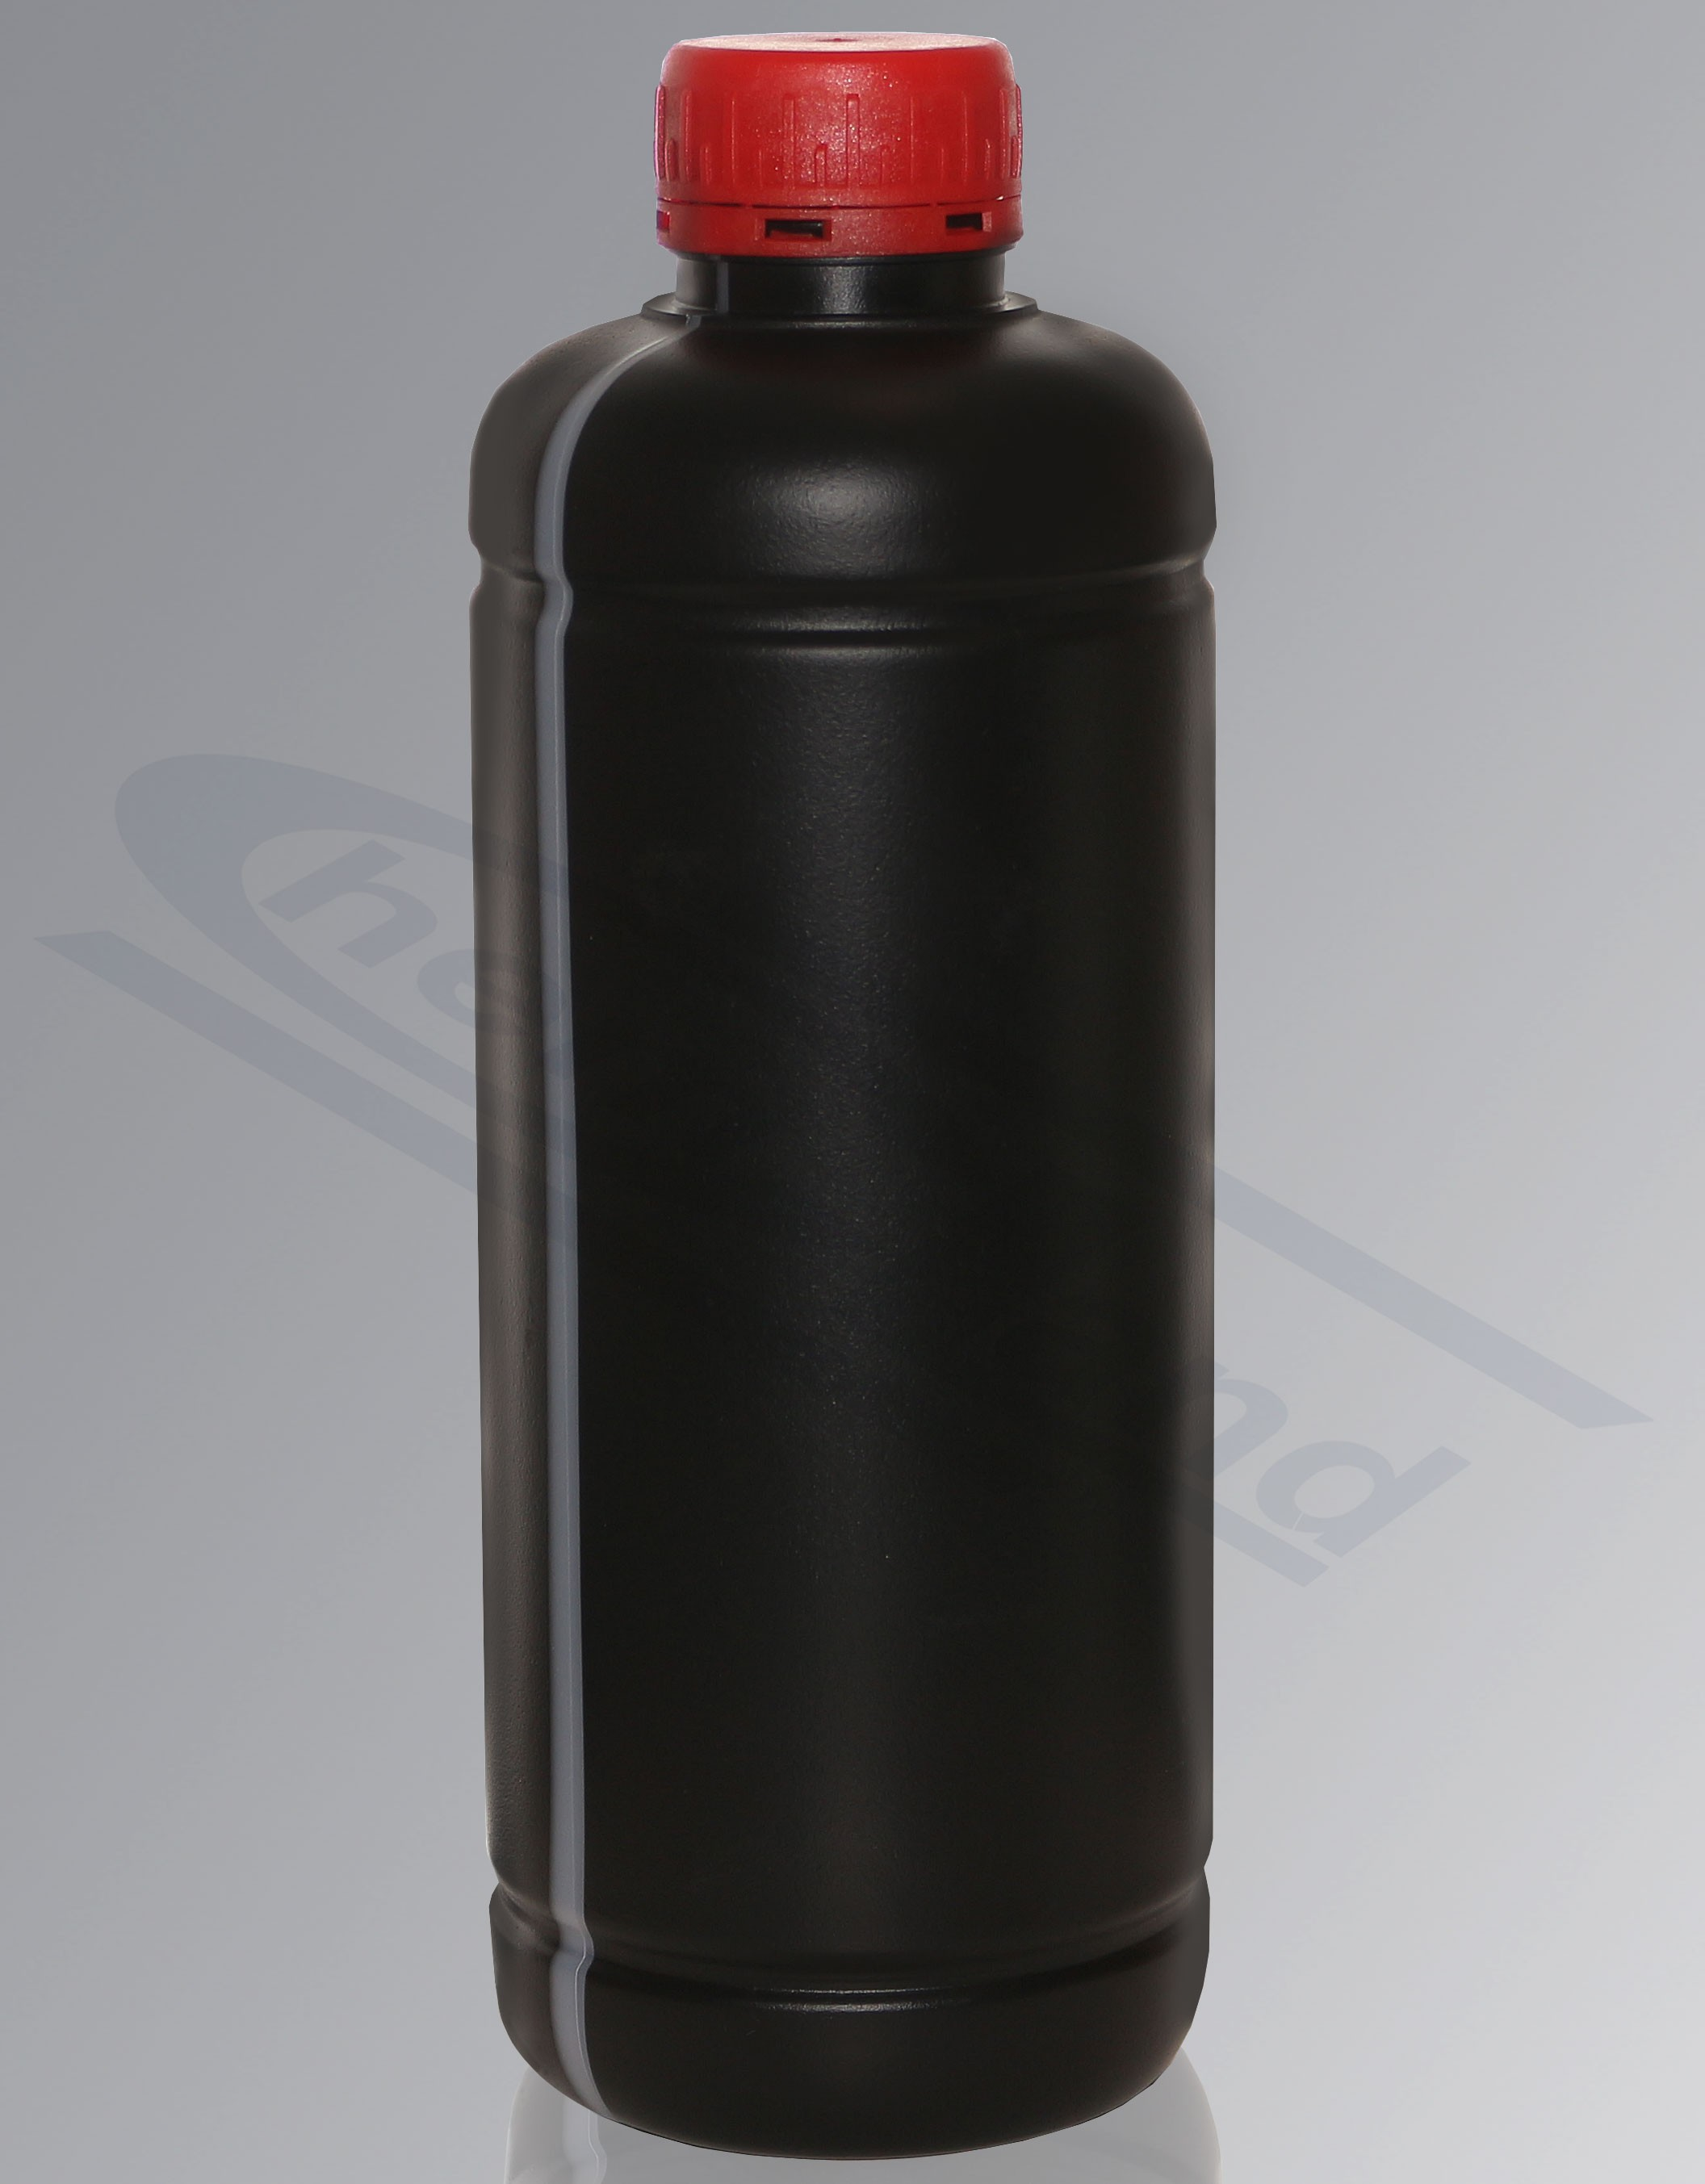 butelka-HDPE-czarna-z-nak-samopl.jpg